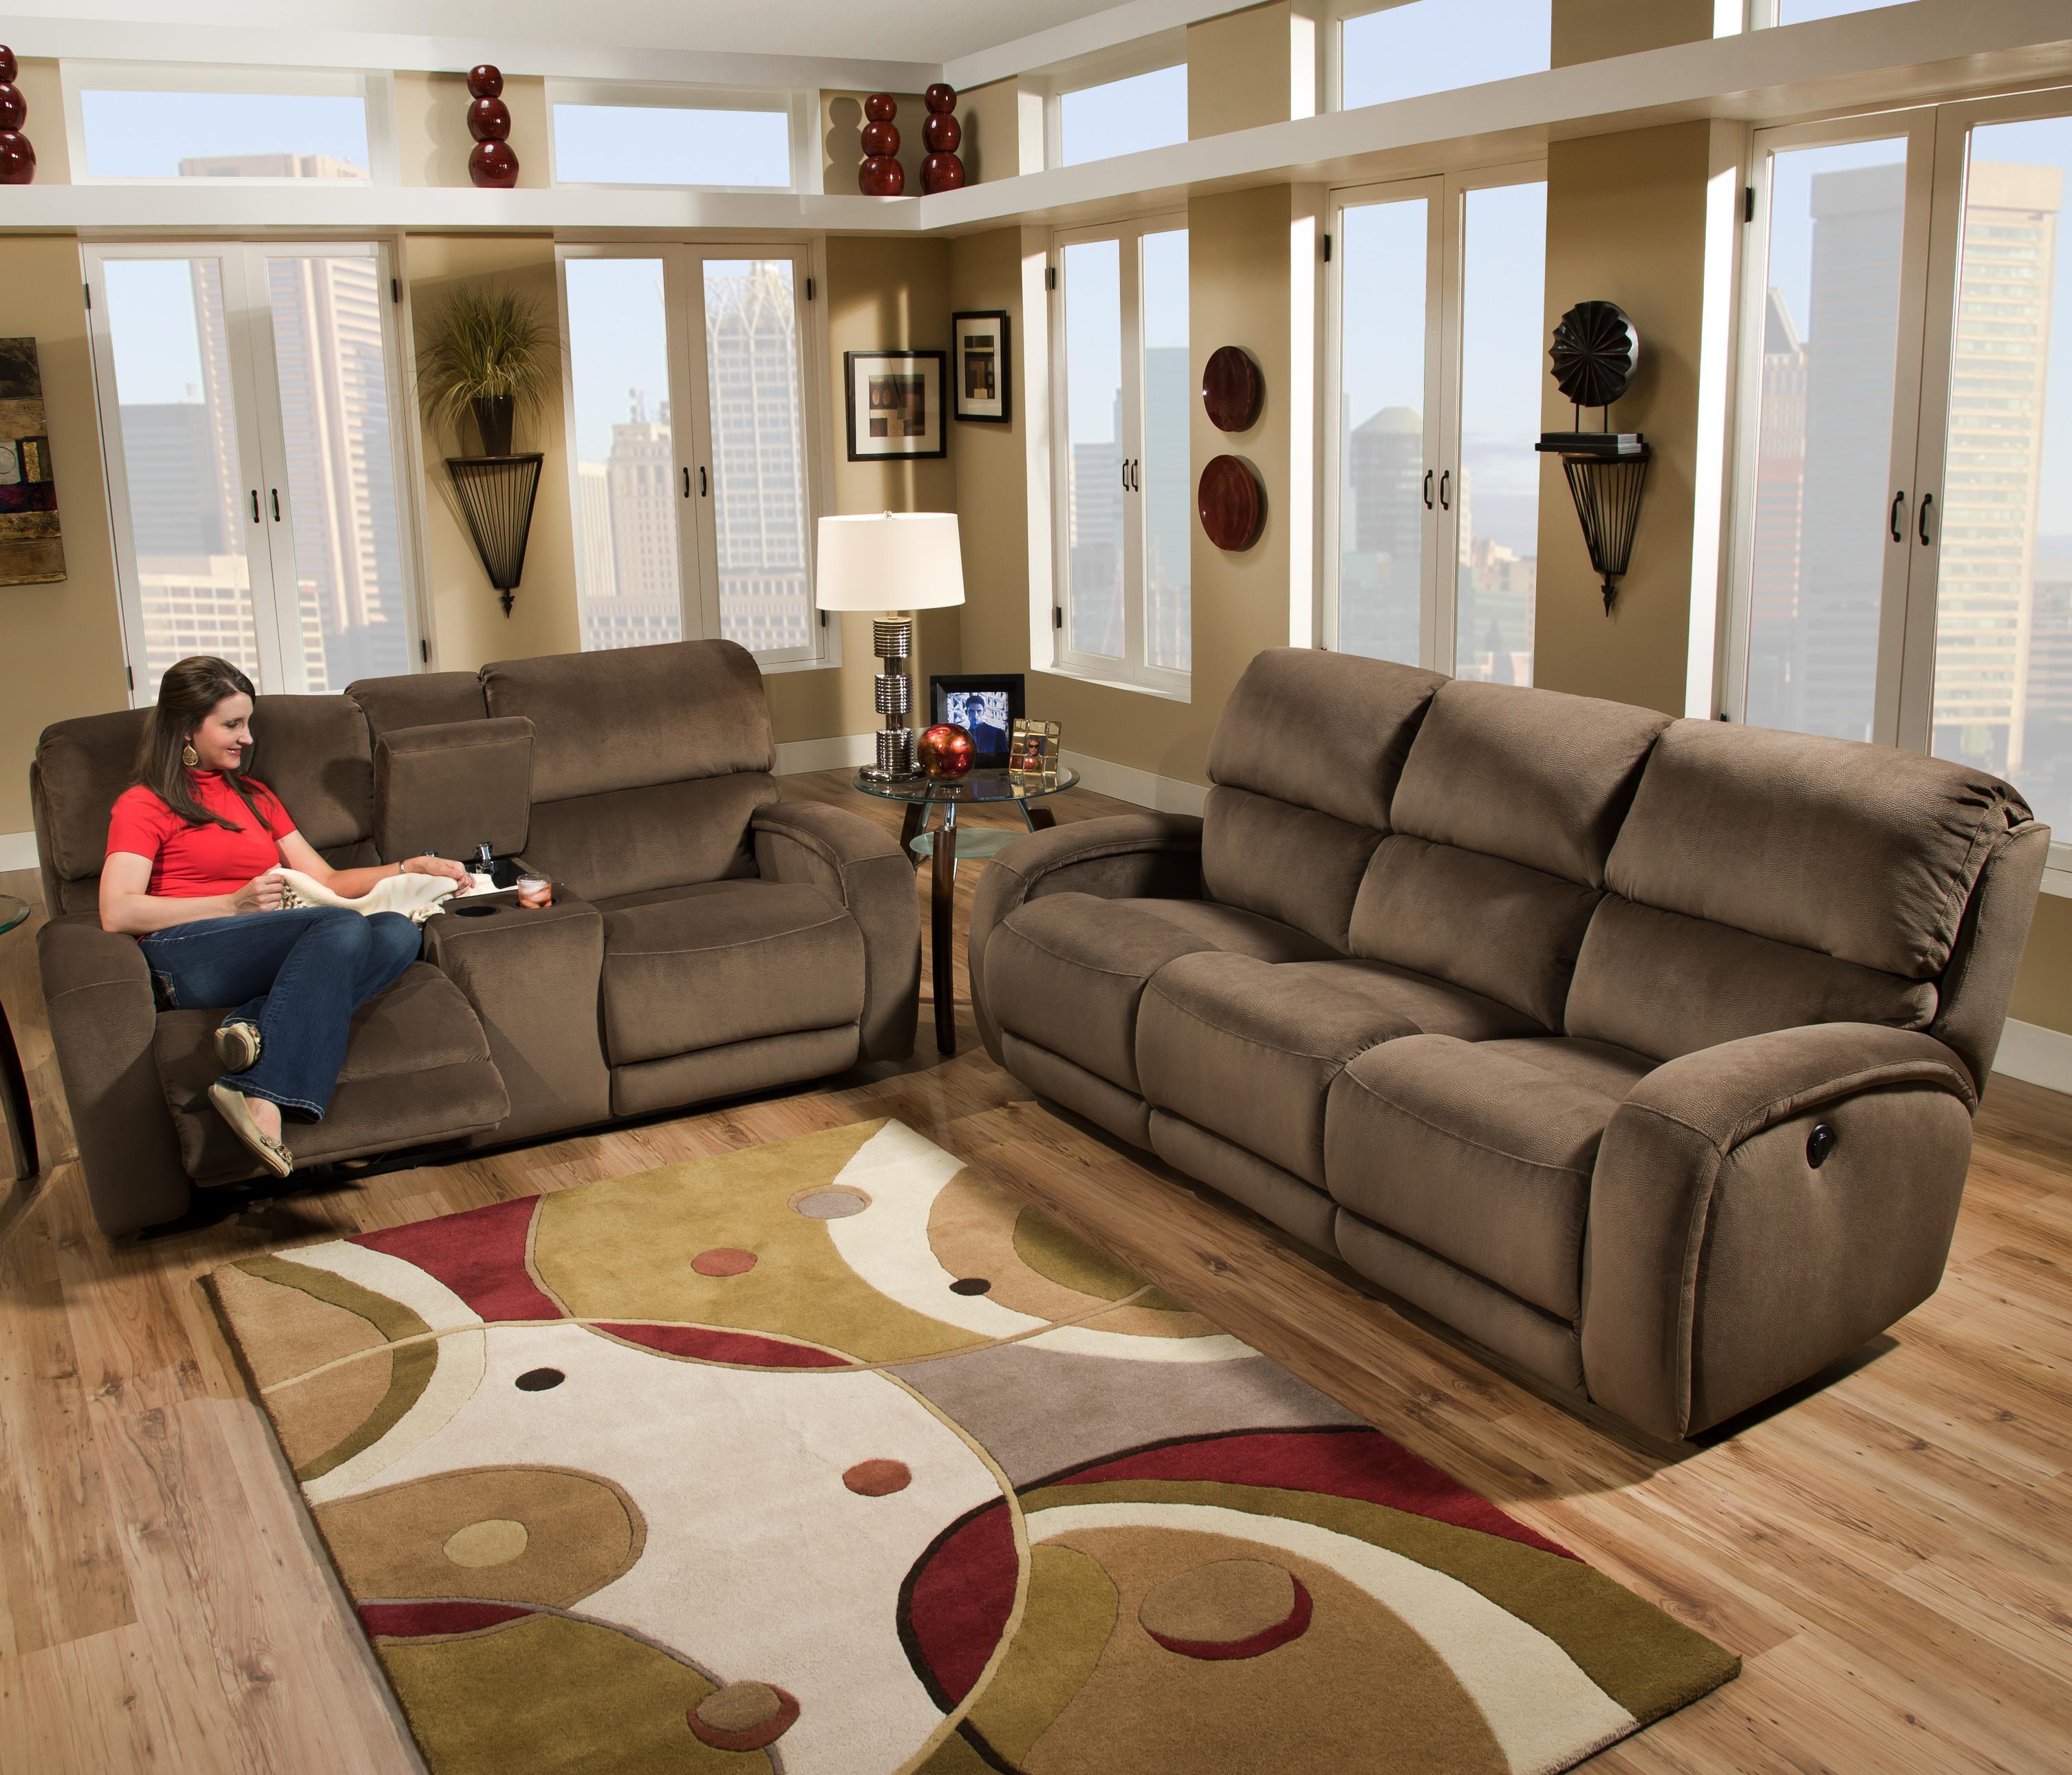 Southern Motion Fandango 884 Power Reclining Sofa with Casual